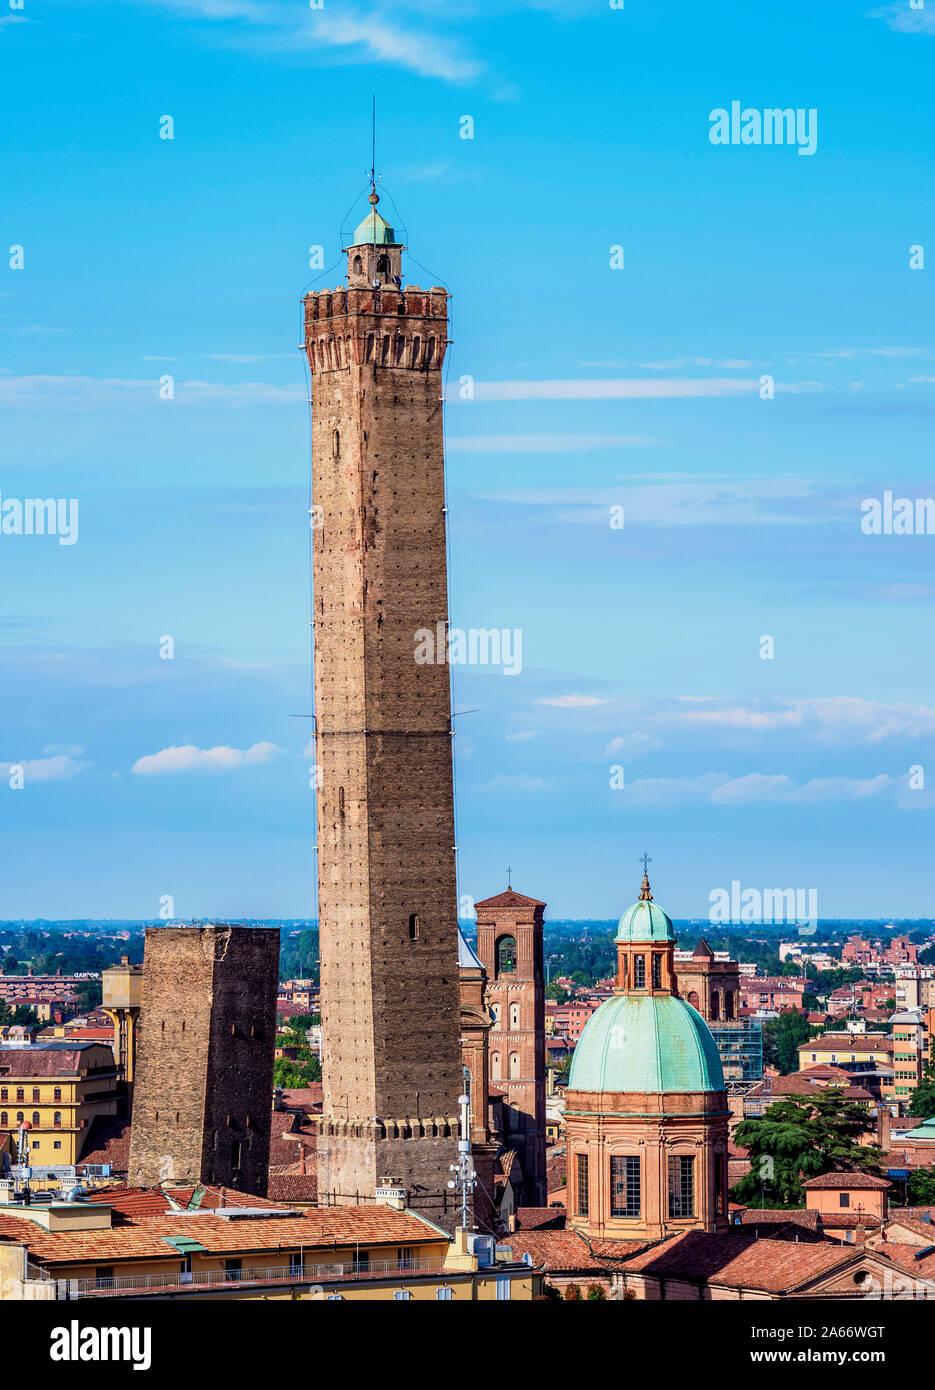 Vista hacia la torre Asinelli, Bolonia, Emilia-Romaña, Italia Foto de stock